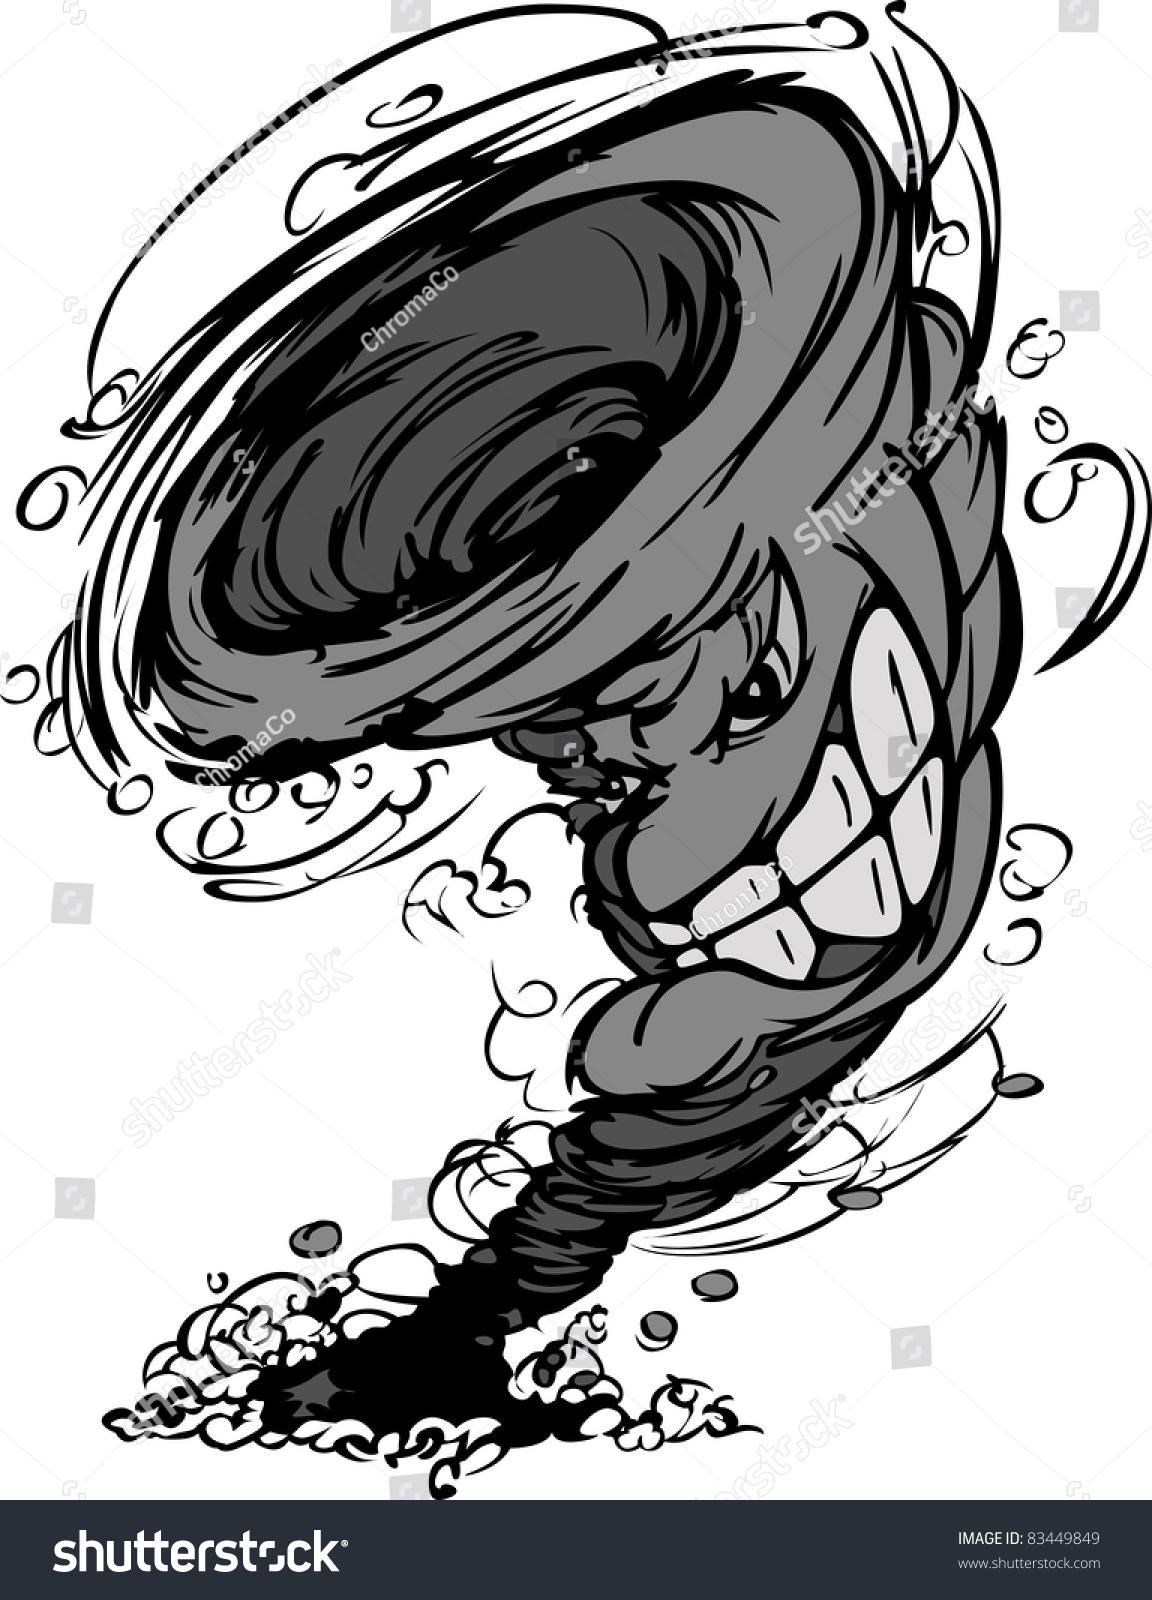 Cartoon of an Angry Lightning Storm Cloud Mascot - Royalty ...   Cartoon Storm